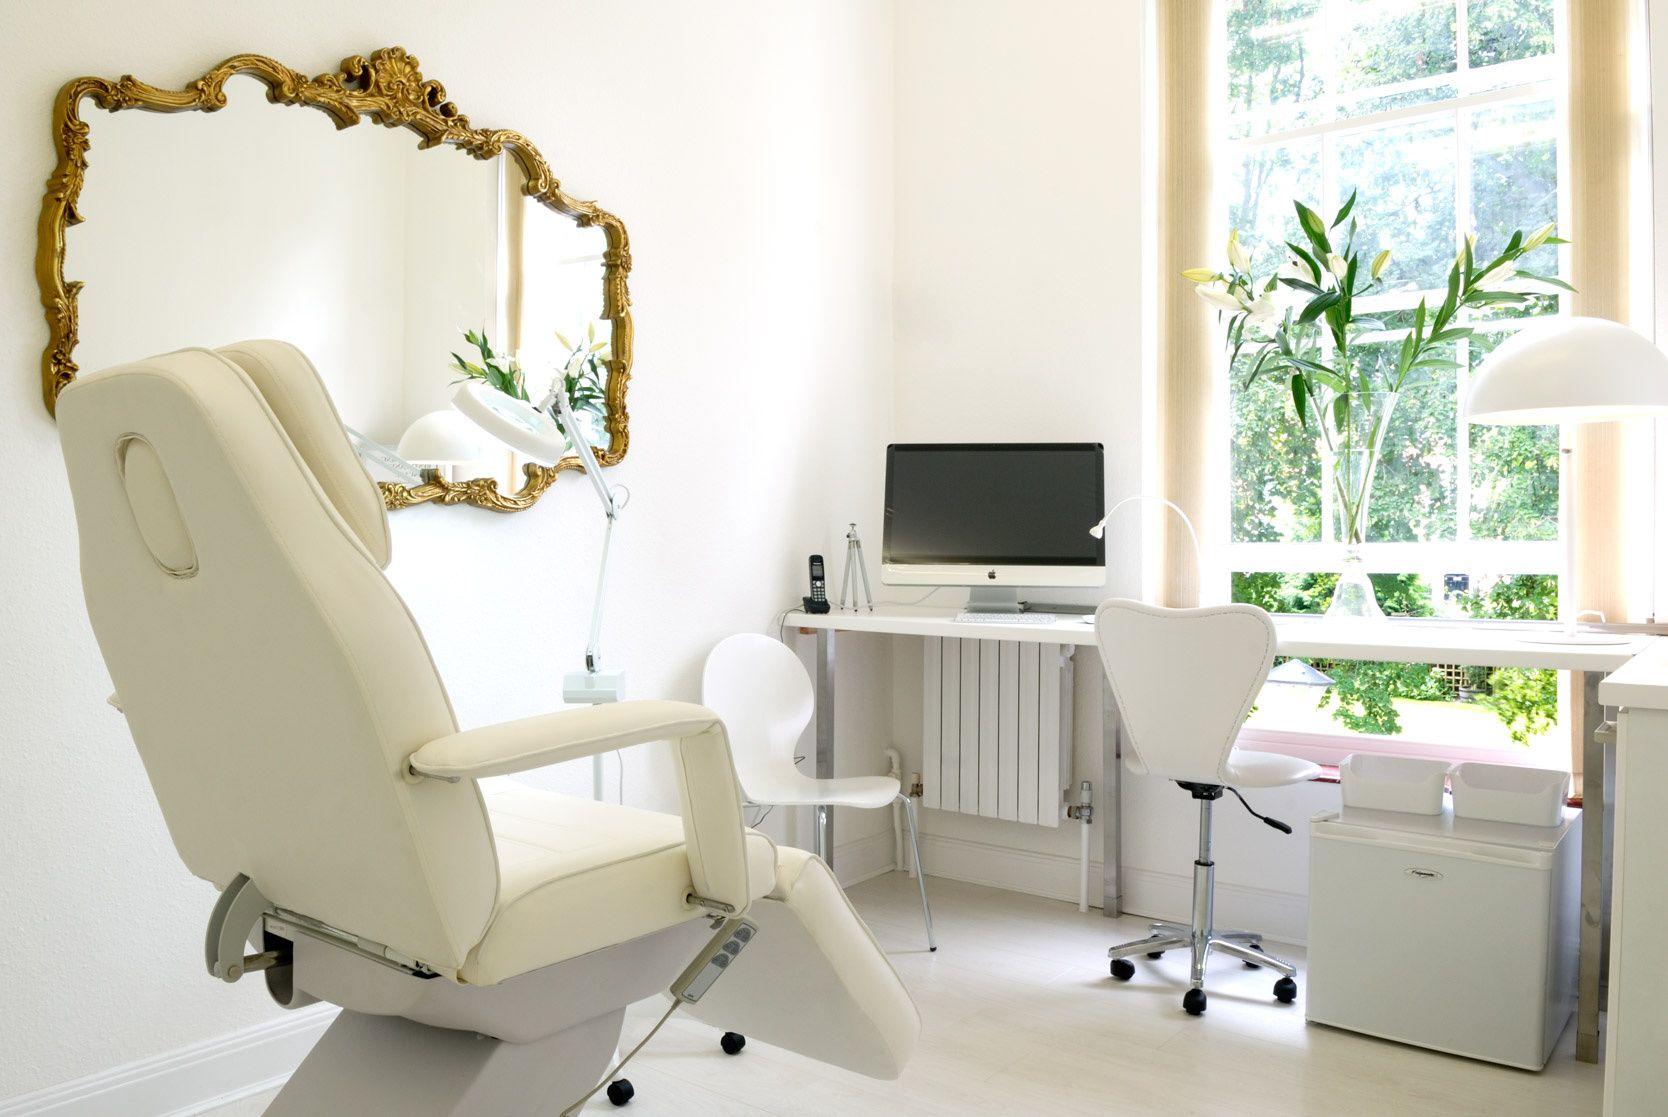 Aesthetic clinic decoration penelusuran google